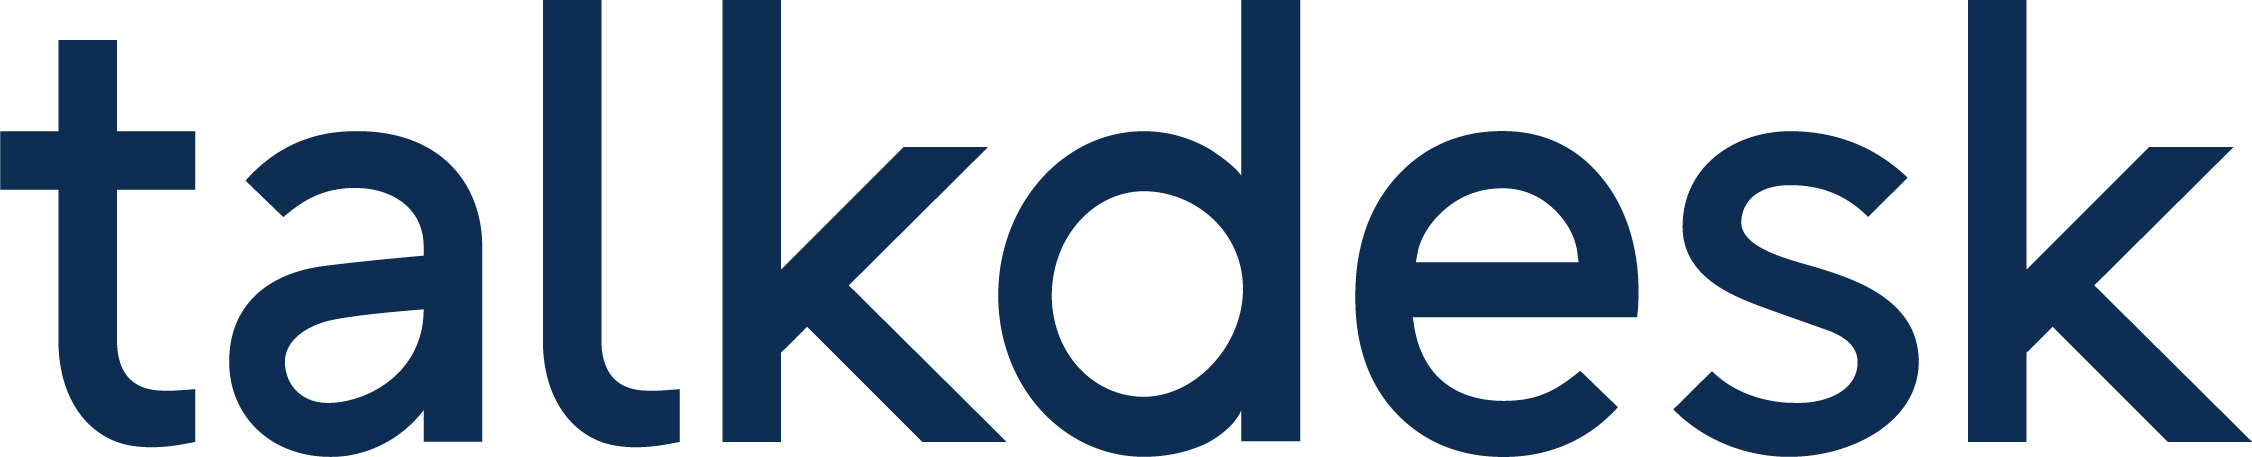 Talkdesk_Logo_2018_cmyk_dark_blue